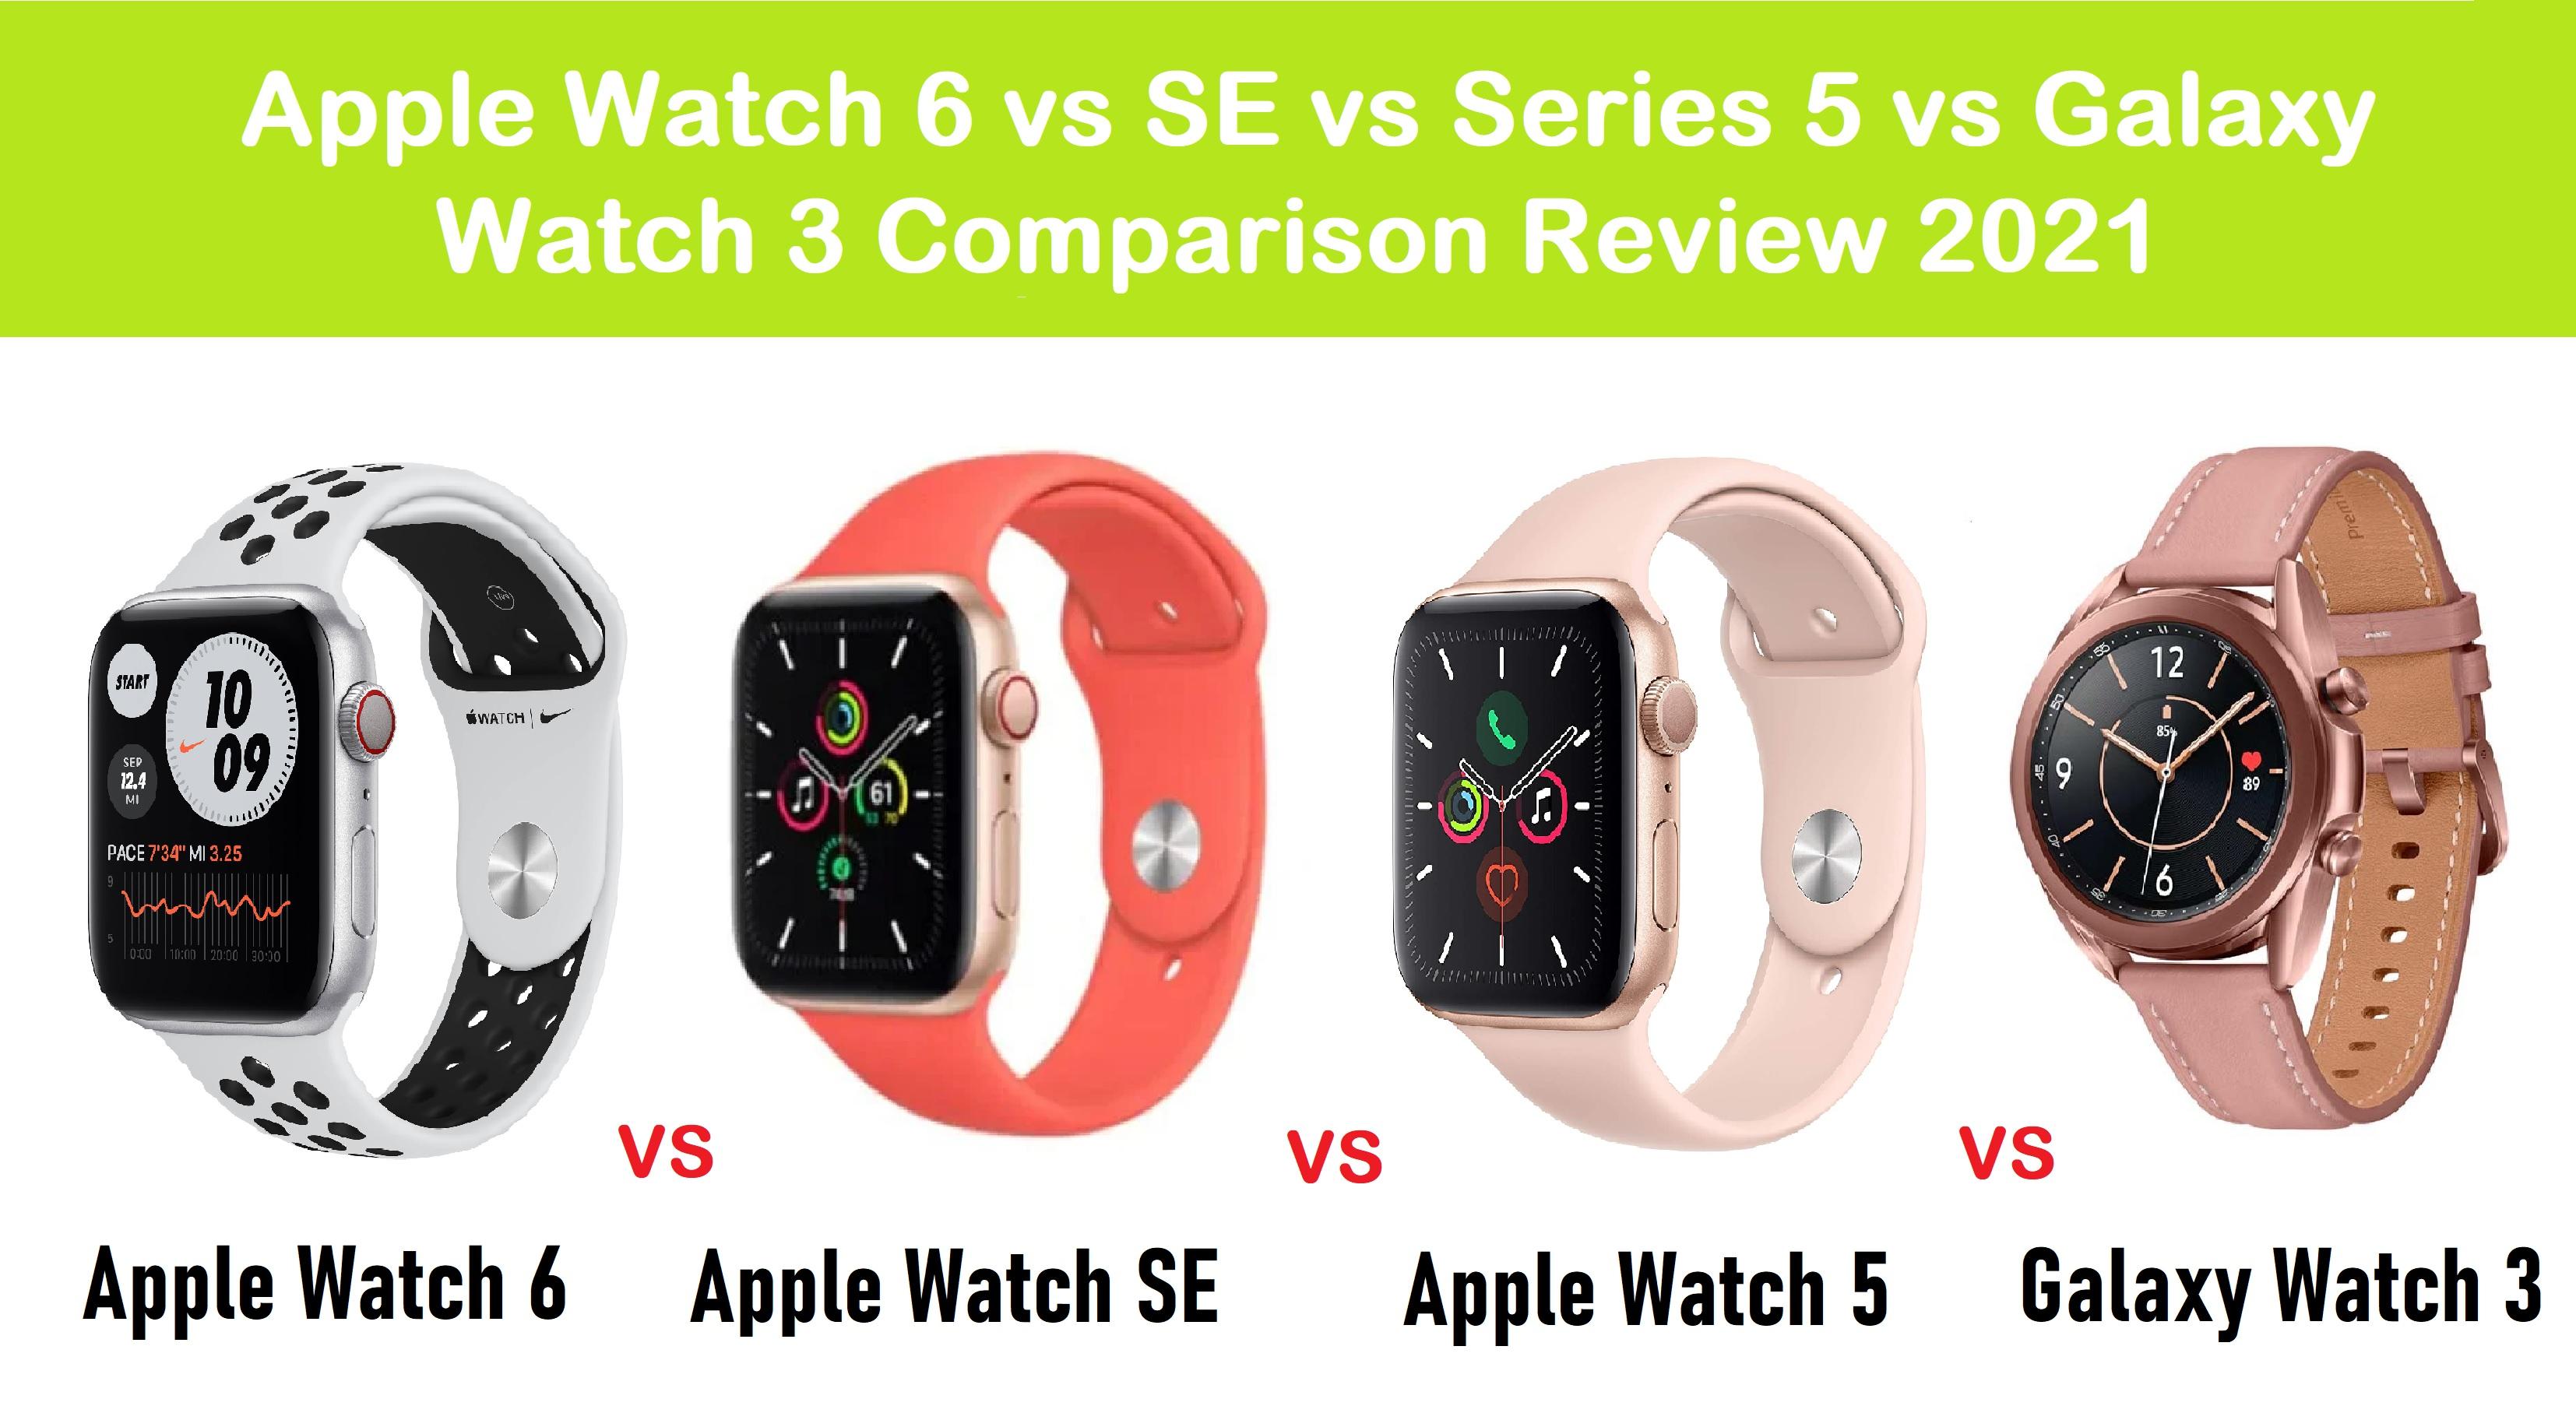 Apple Watch 6 vs SE vs Series 5 vs Galaxy Watch 3 Comparison Review 2021